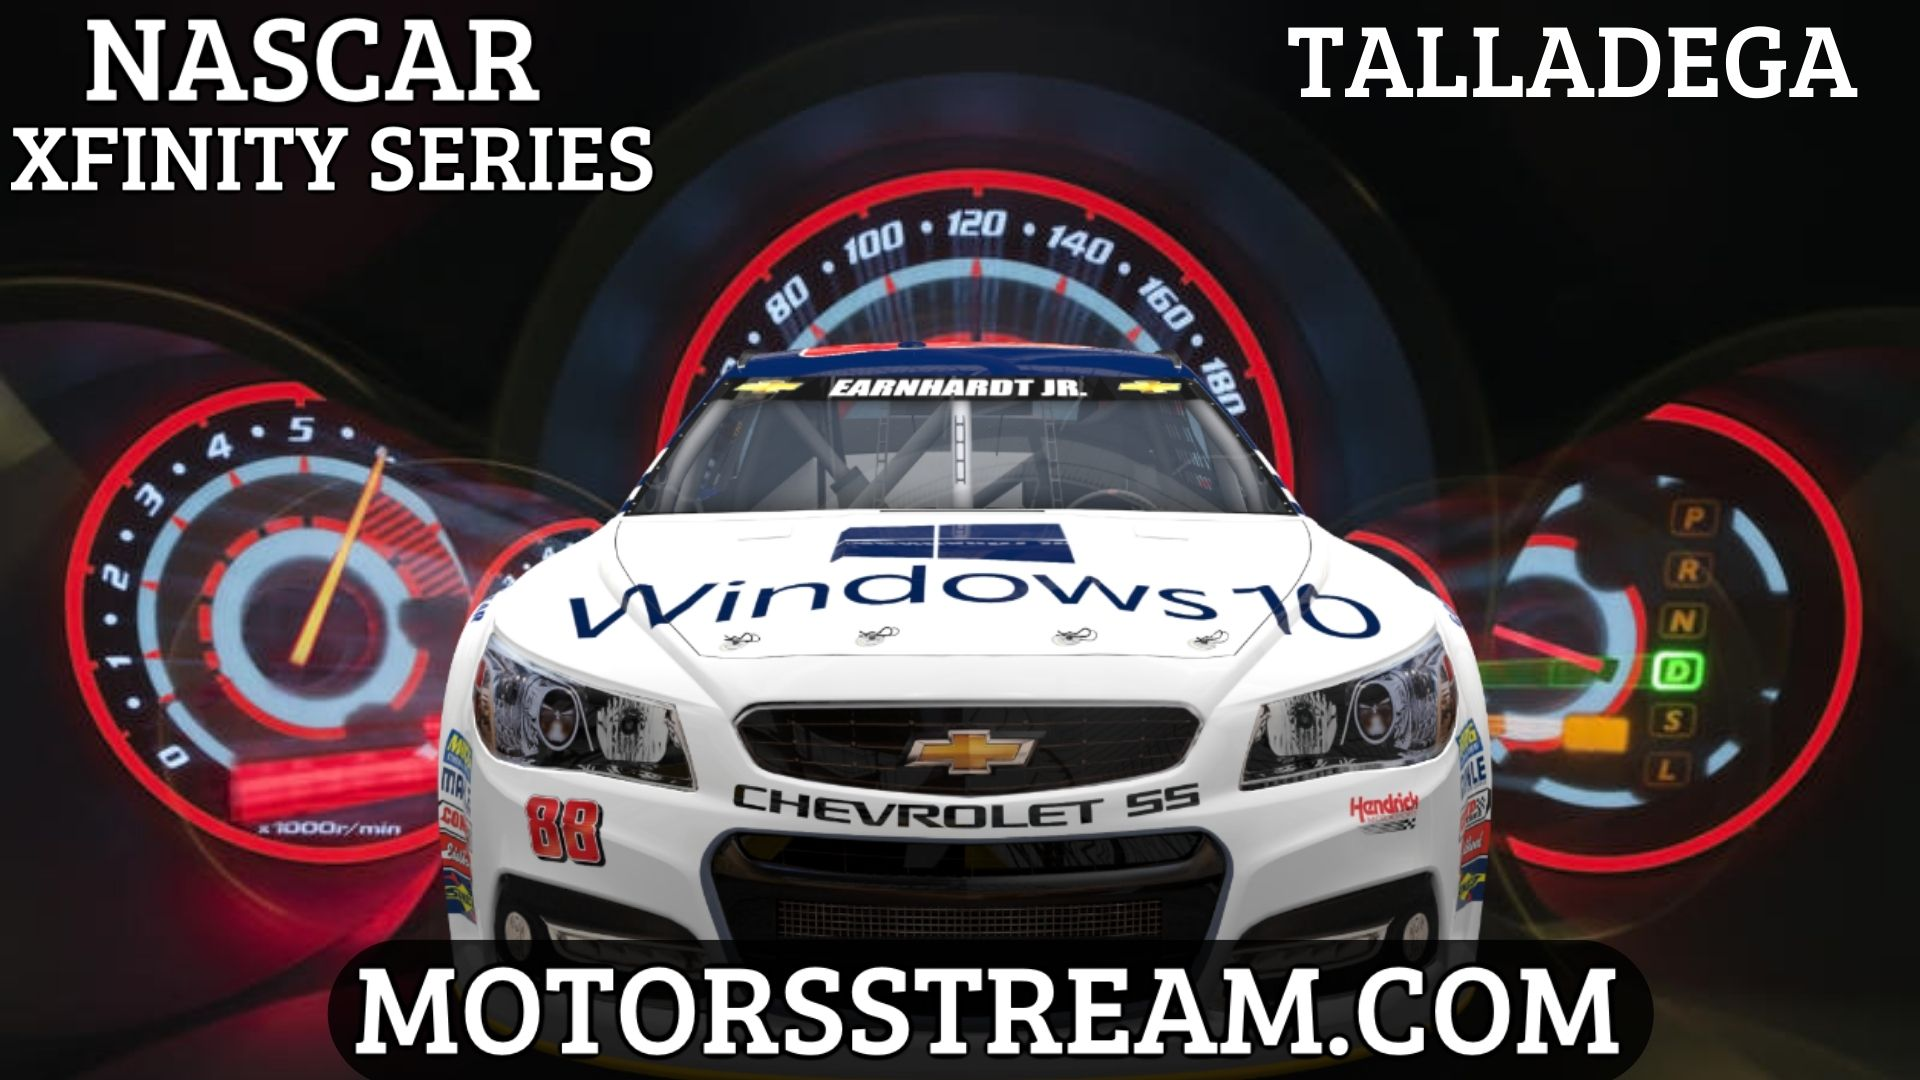 NASCAR Xfinity Series Playoff Race At Talladega Live Stream | Talladega 2021